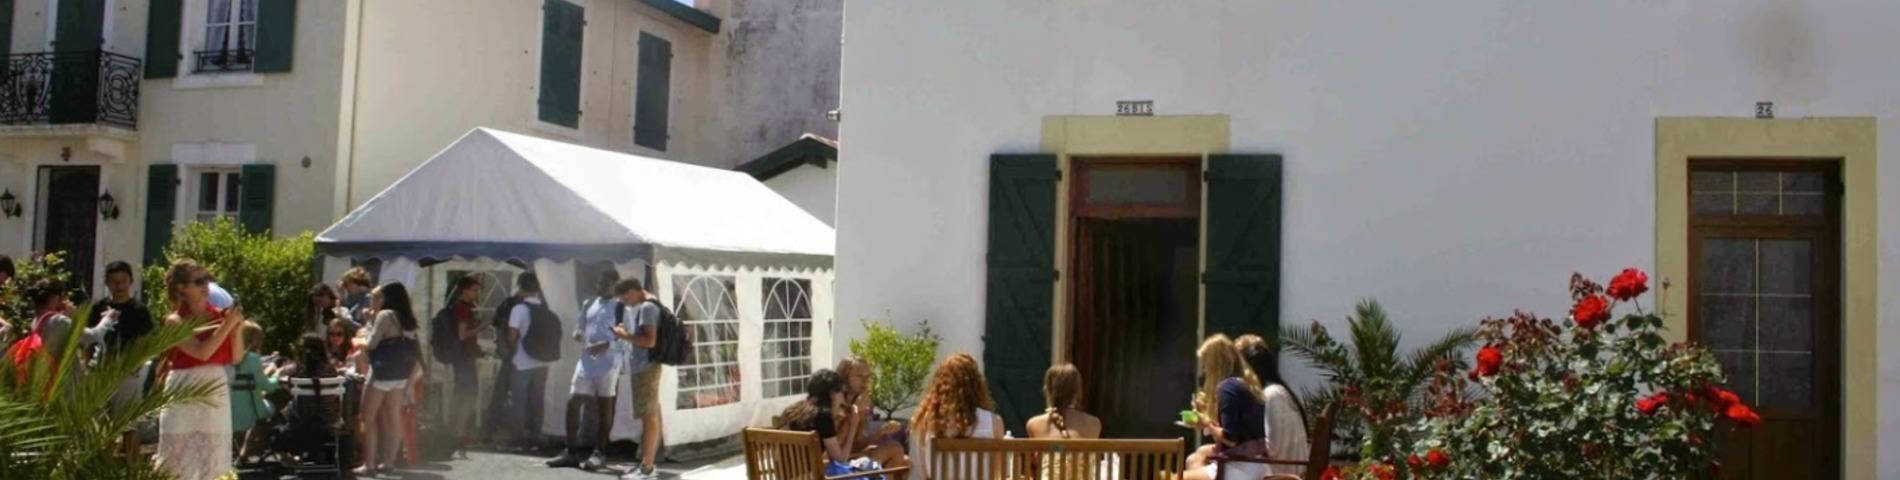 Biarritz French Courses Institute صورة 1